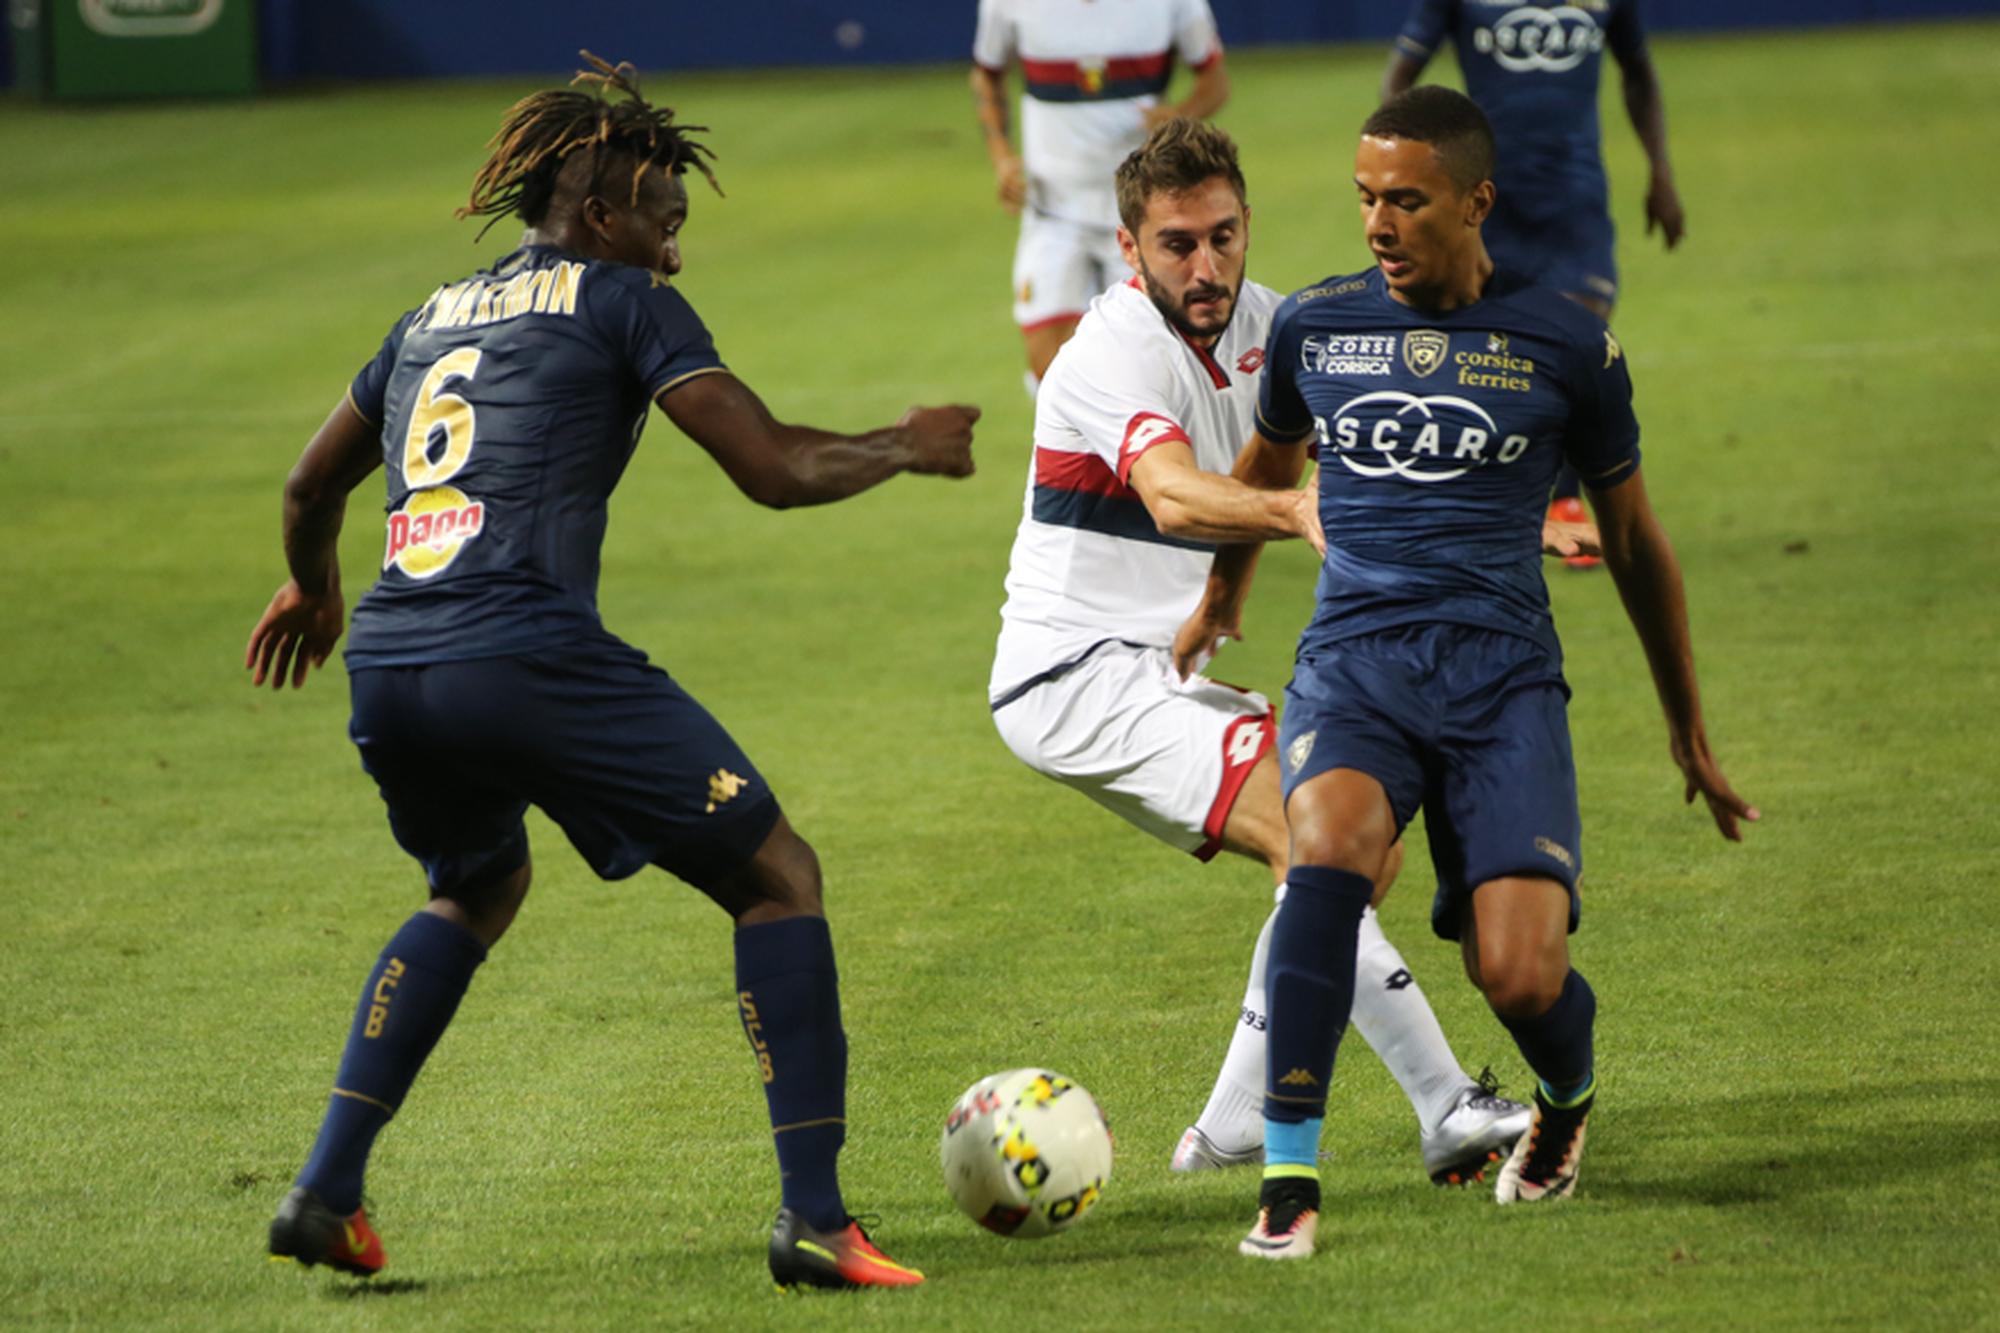 Bastia-Genoa